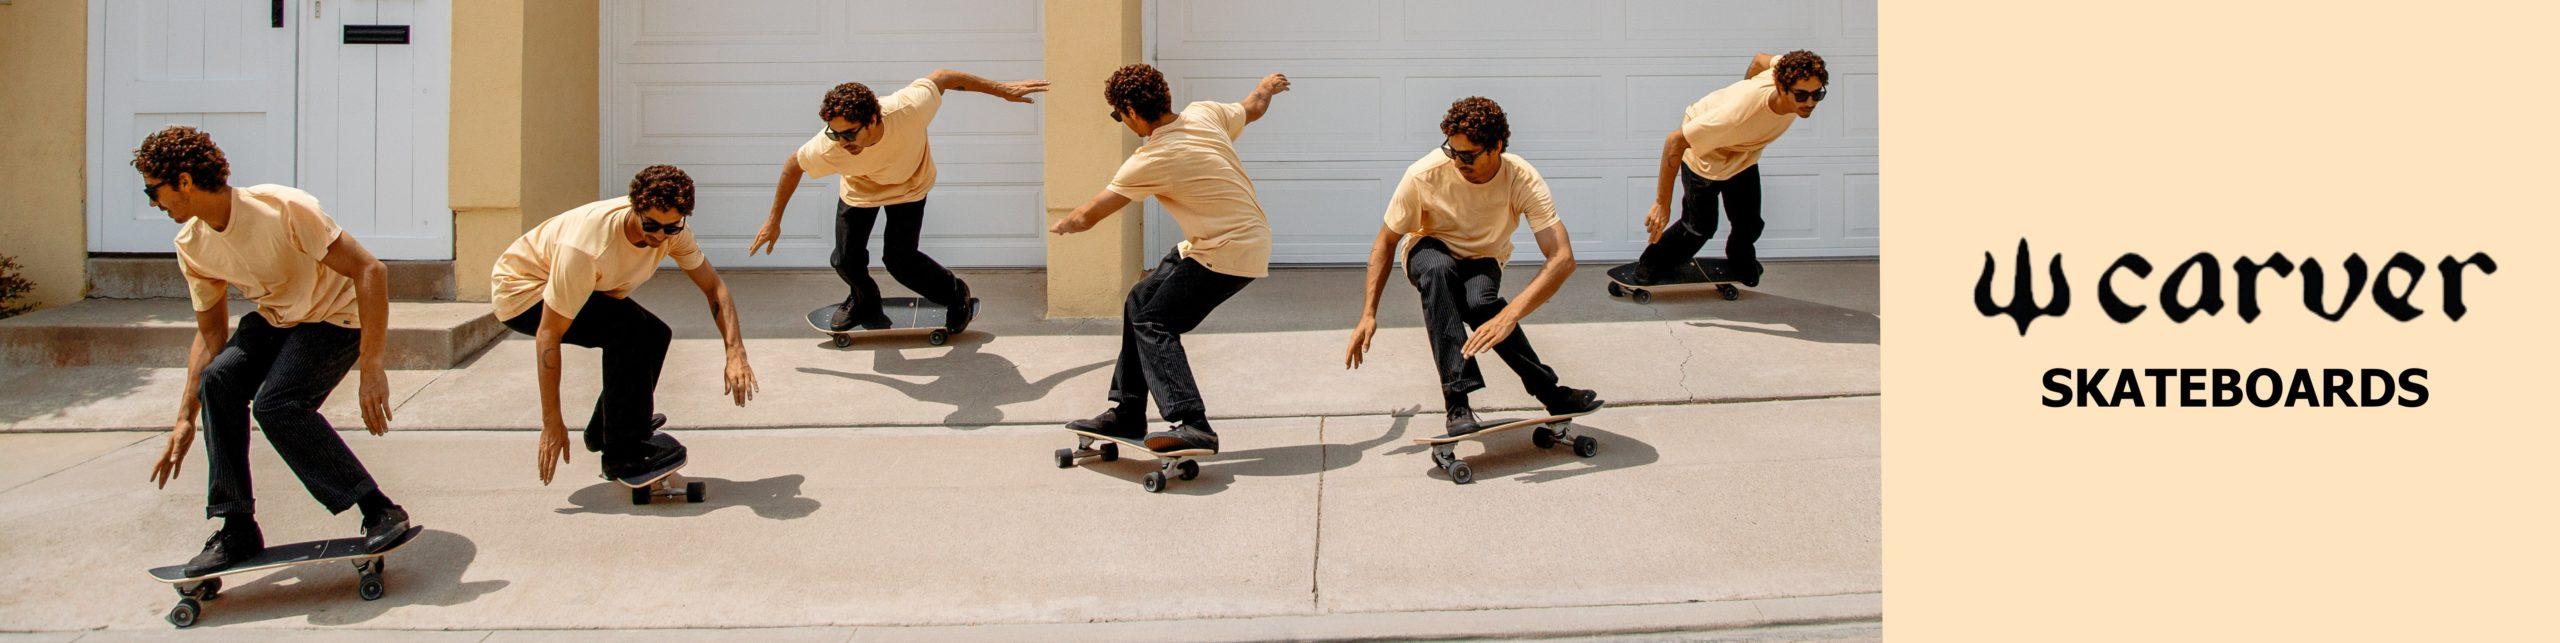 Carver Skateboards Banner